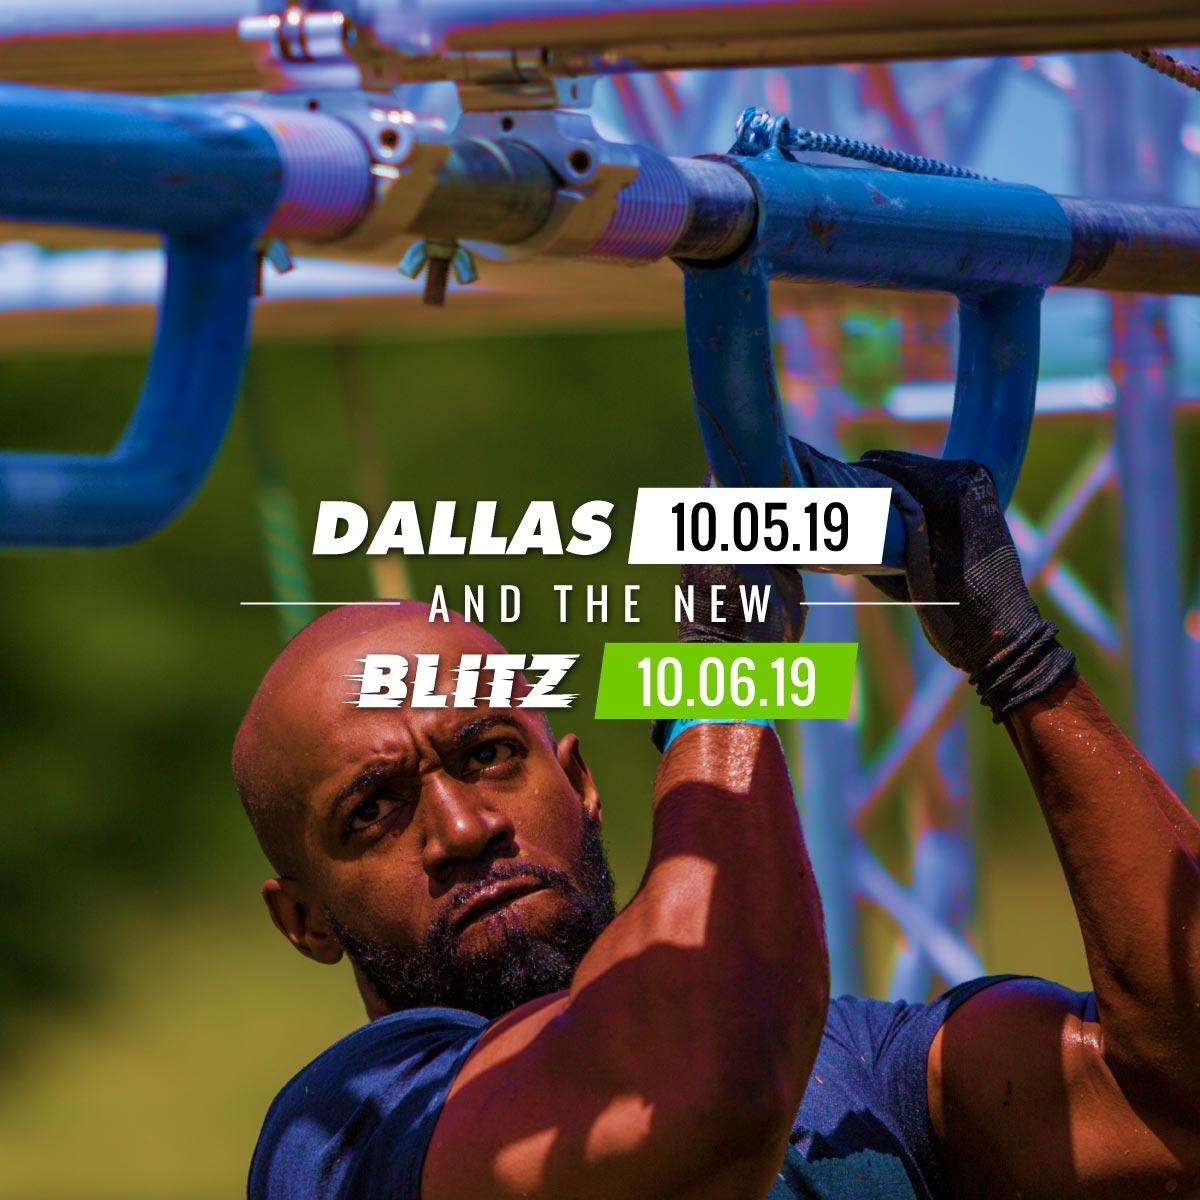 Dallas Texas 2019